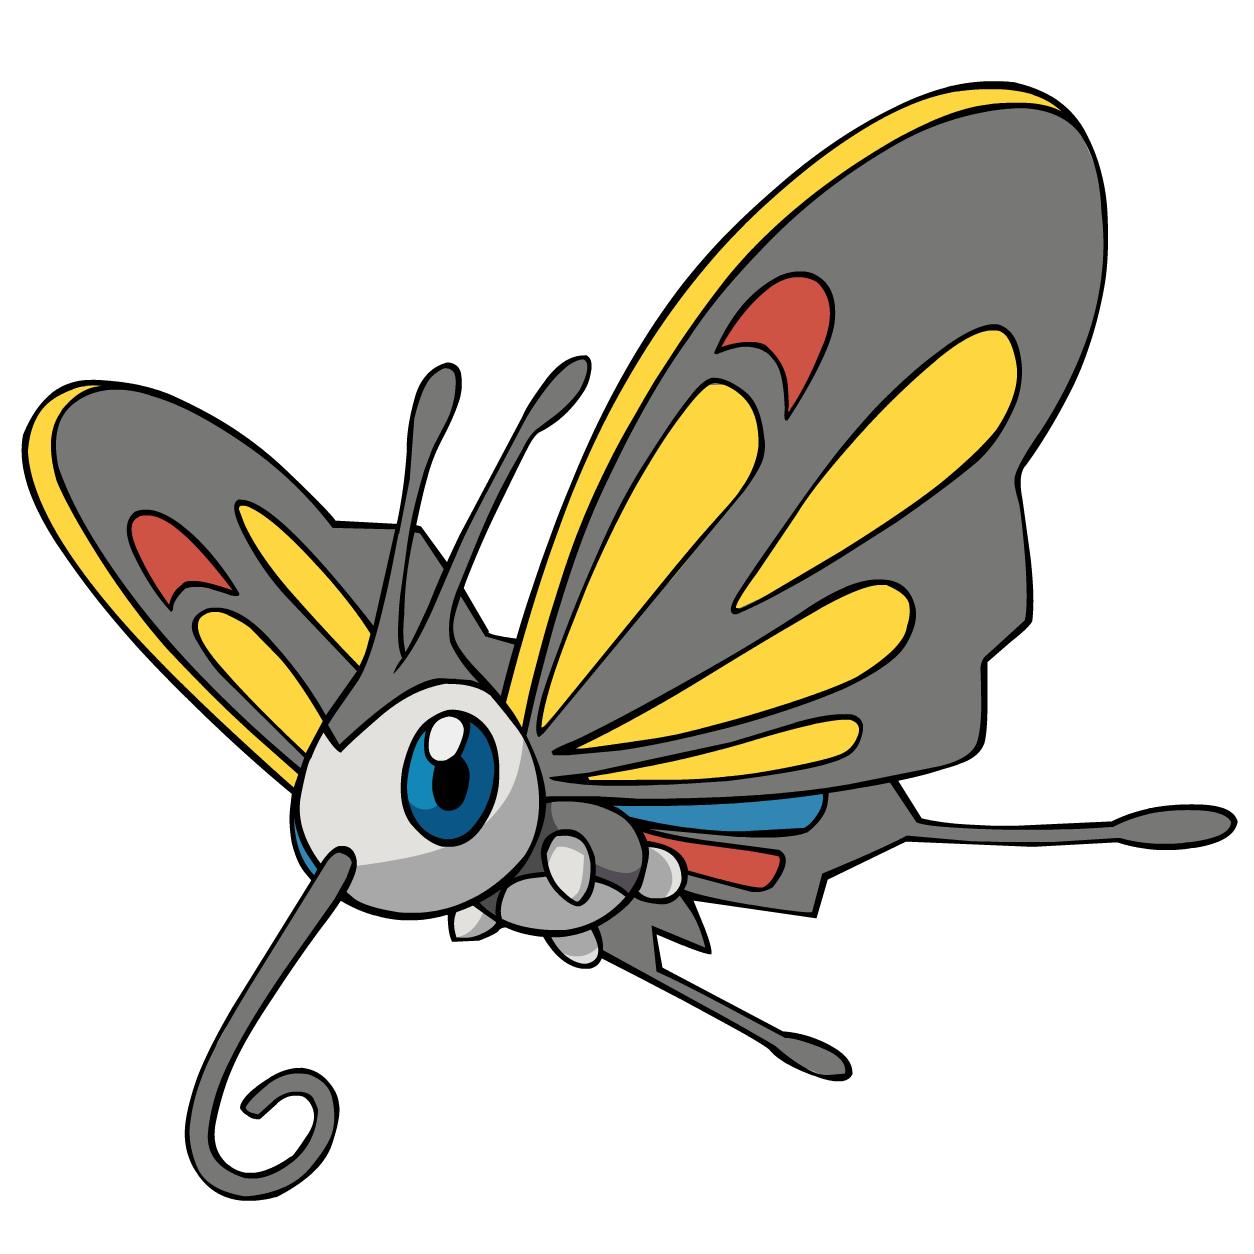 Beautifly Pokemon Evolution 267Beautifly AG anime 2